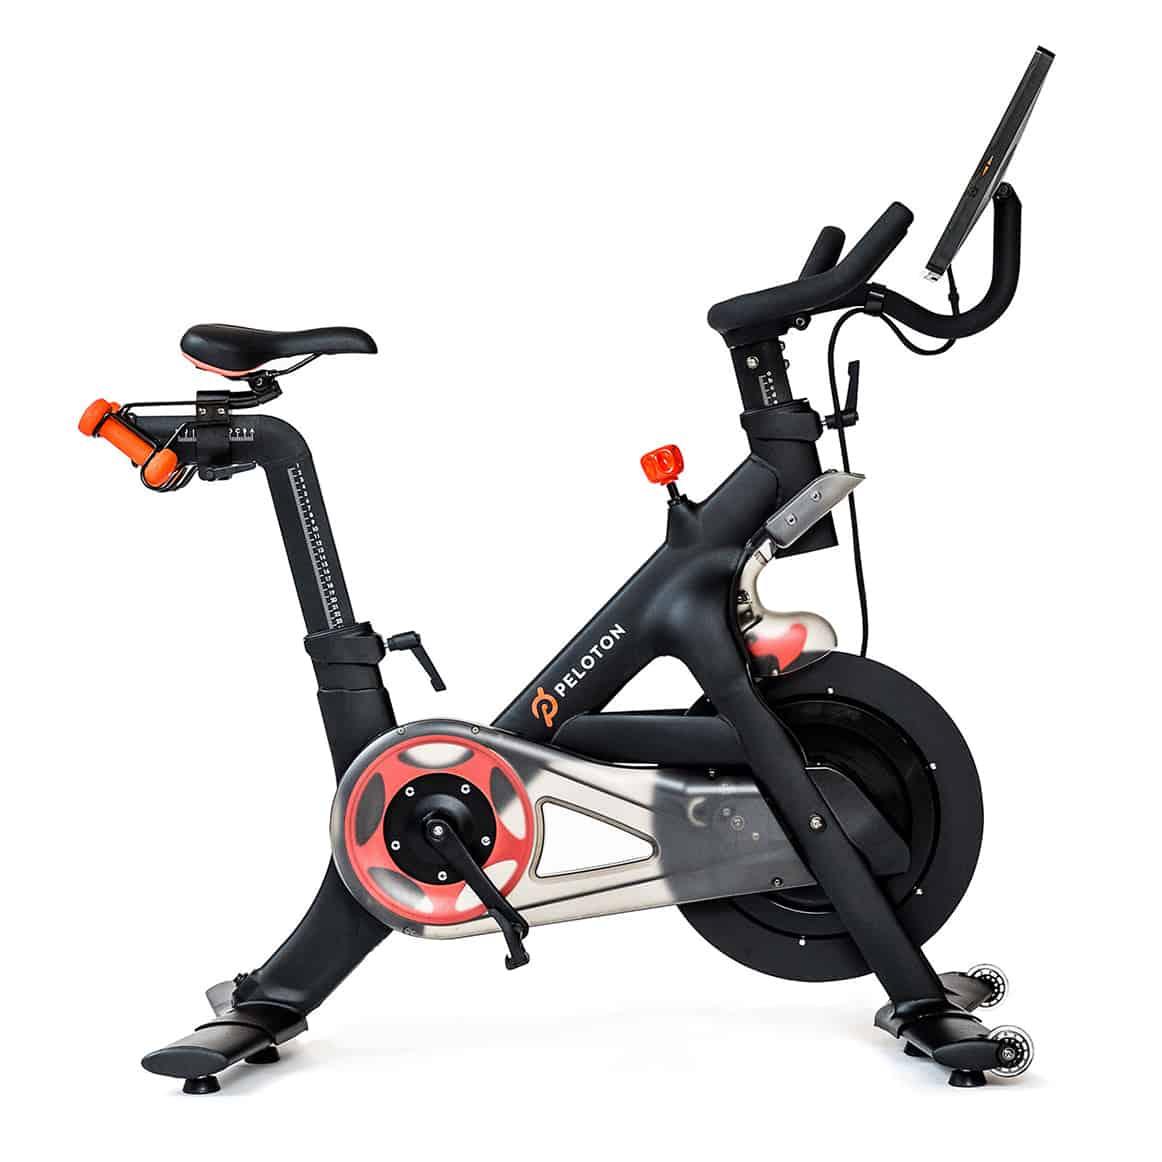 a picture of a peloton bike